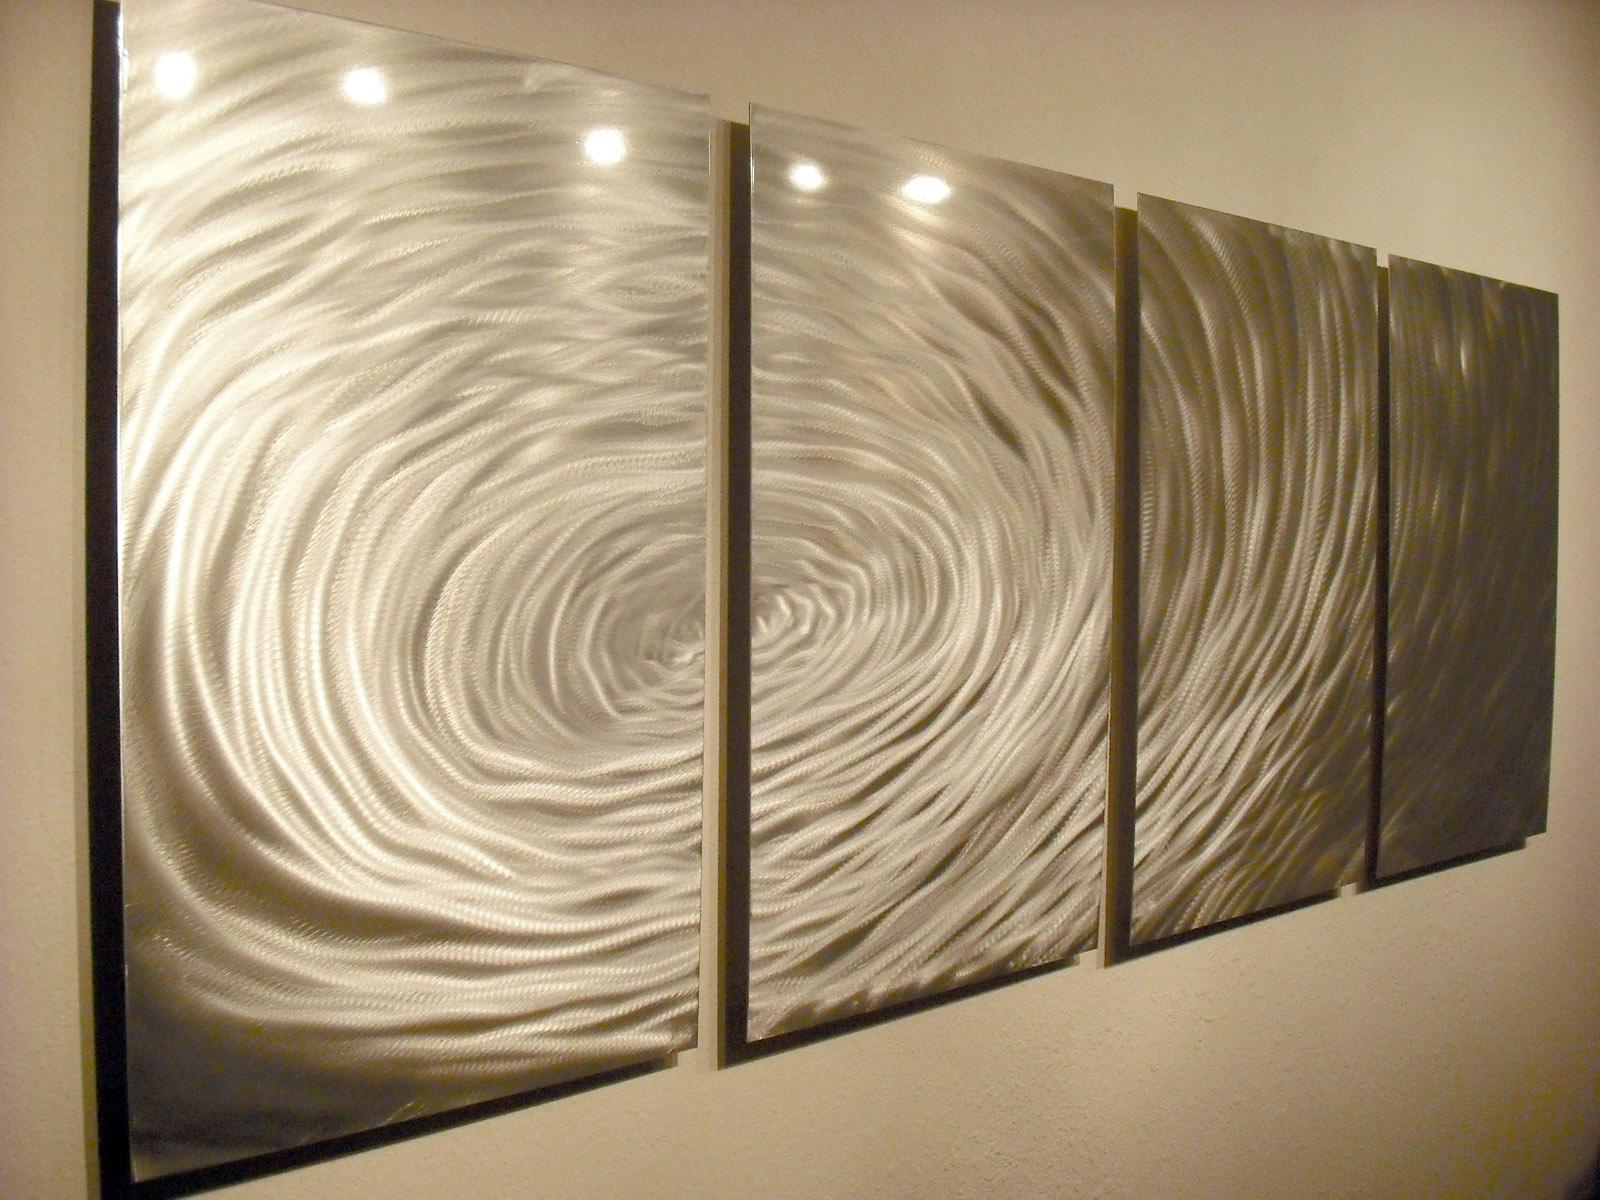 Rippling- Abstract Metal Wall Art Contemporary Modern